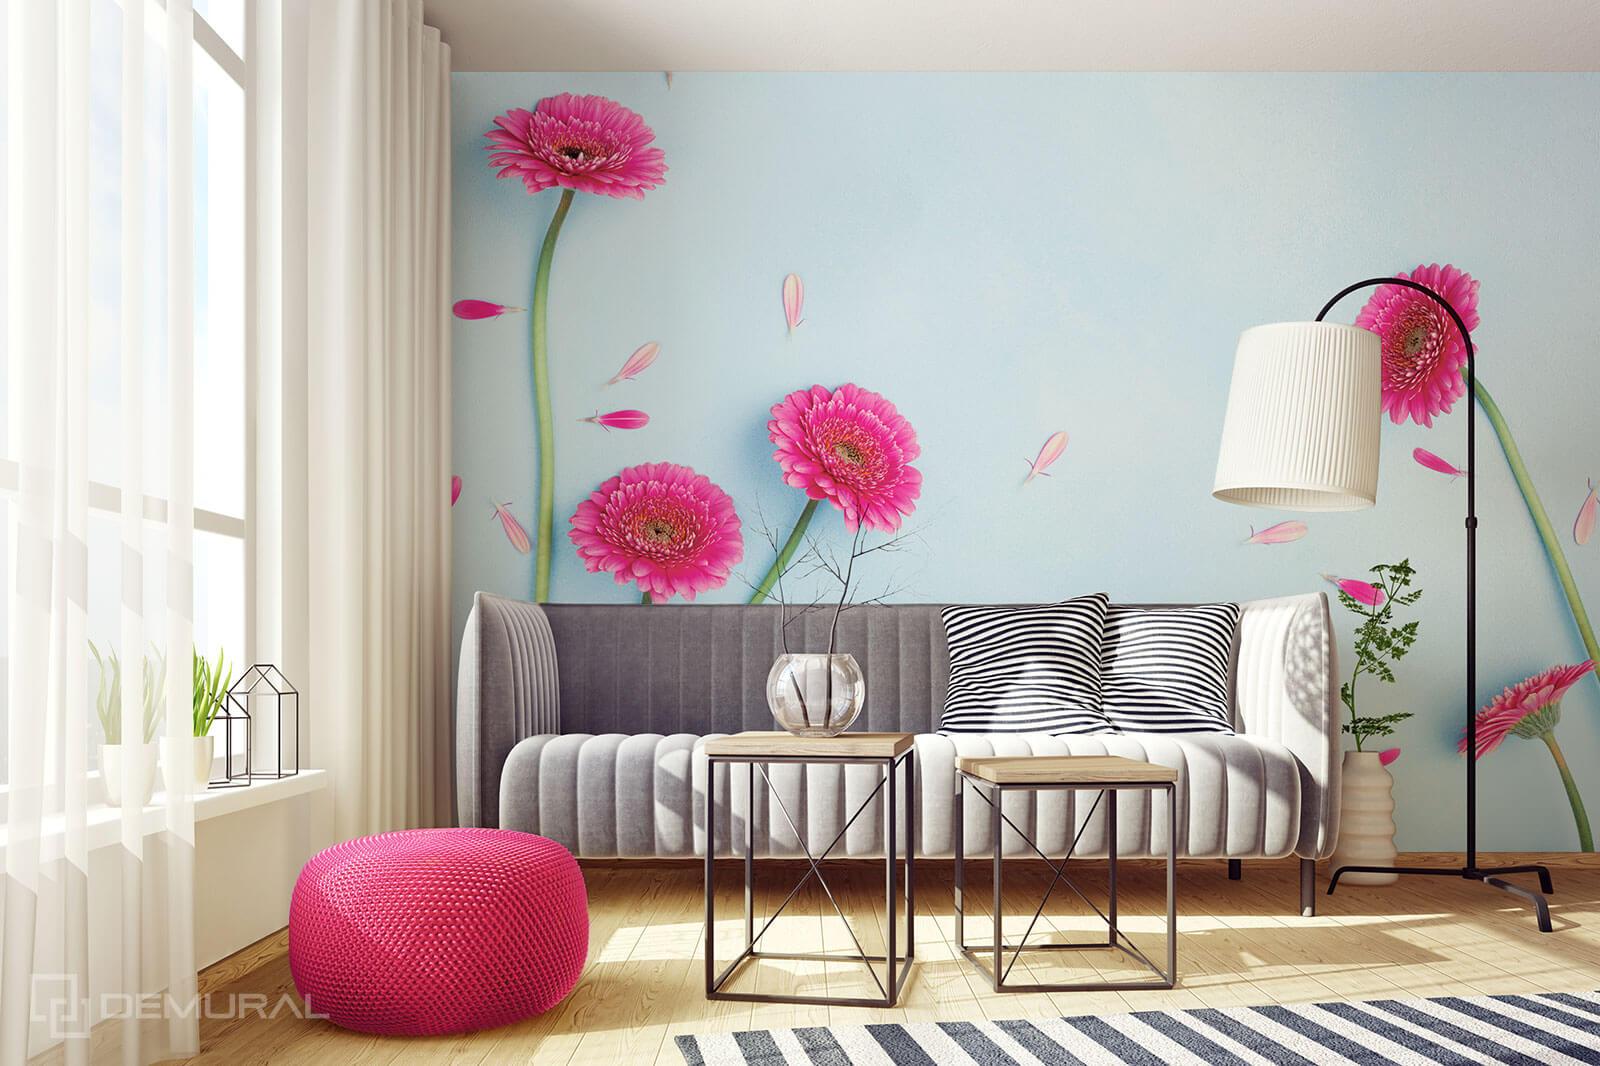 Photo wallpaper Pink Dasies - Flowe photo wallpaper - Demural